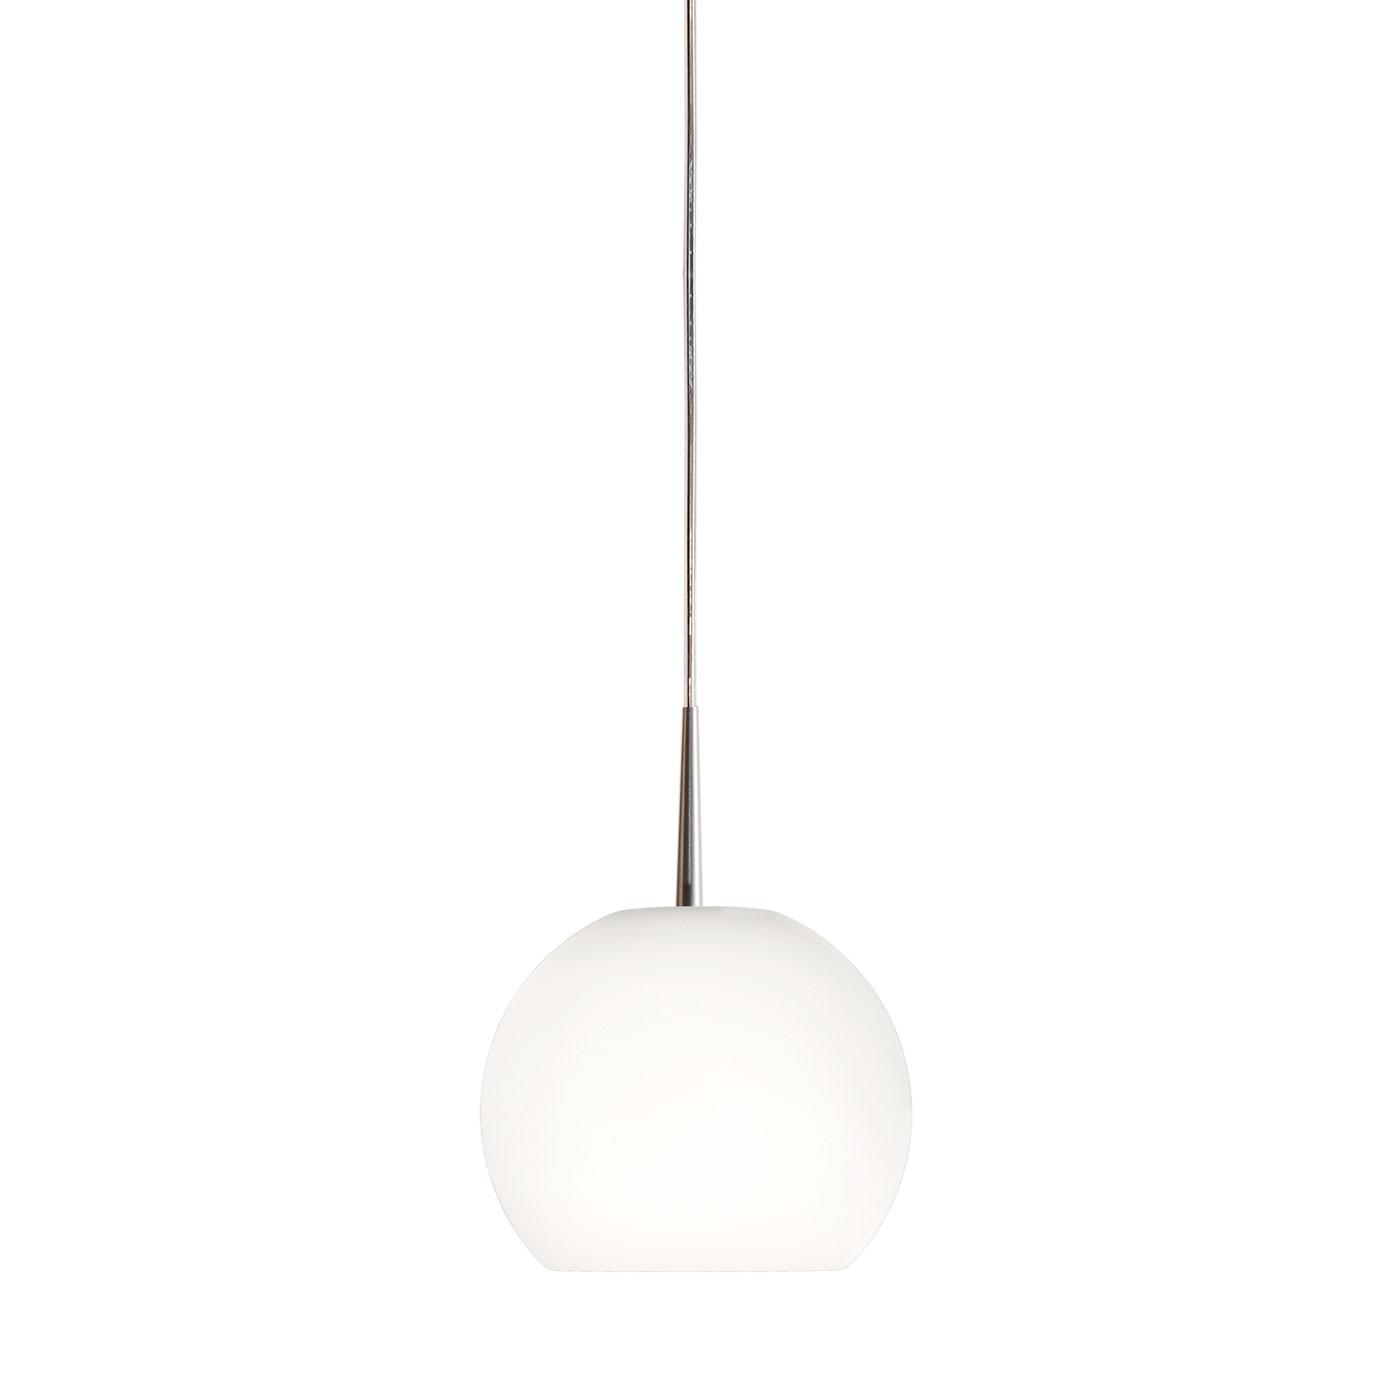 Casablanca Ball Pendant Light